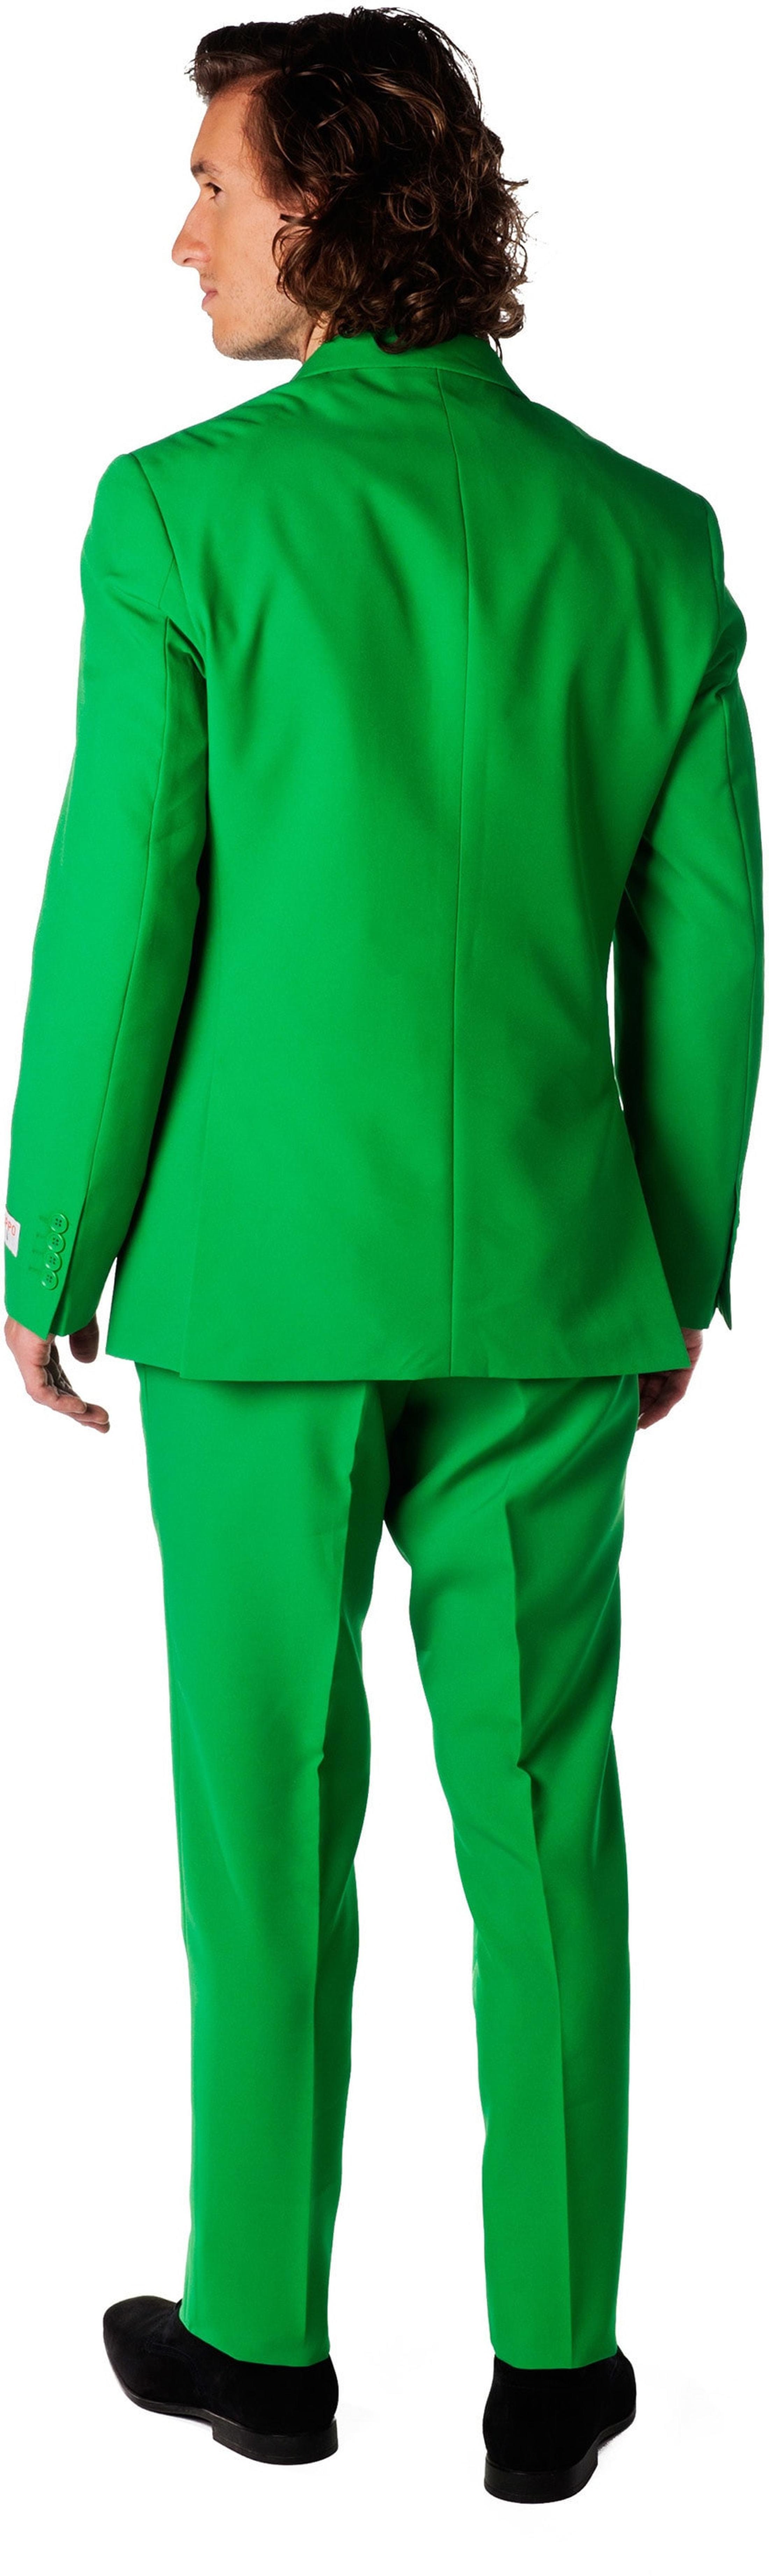 OppoSuits Evergreen Kostuum foto 1